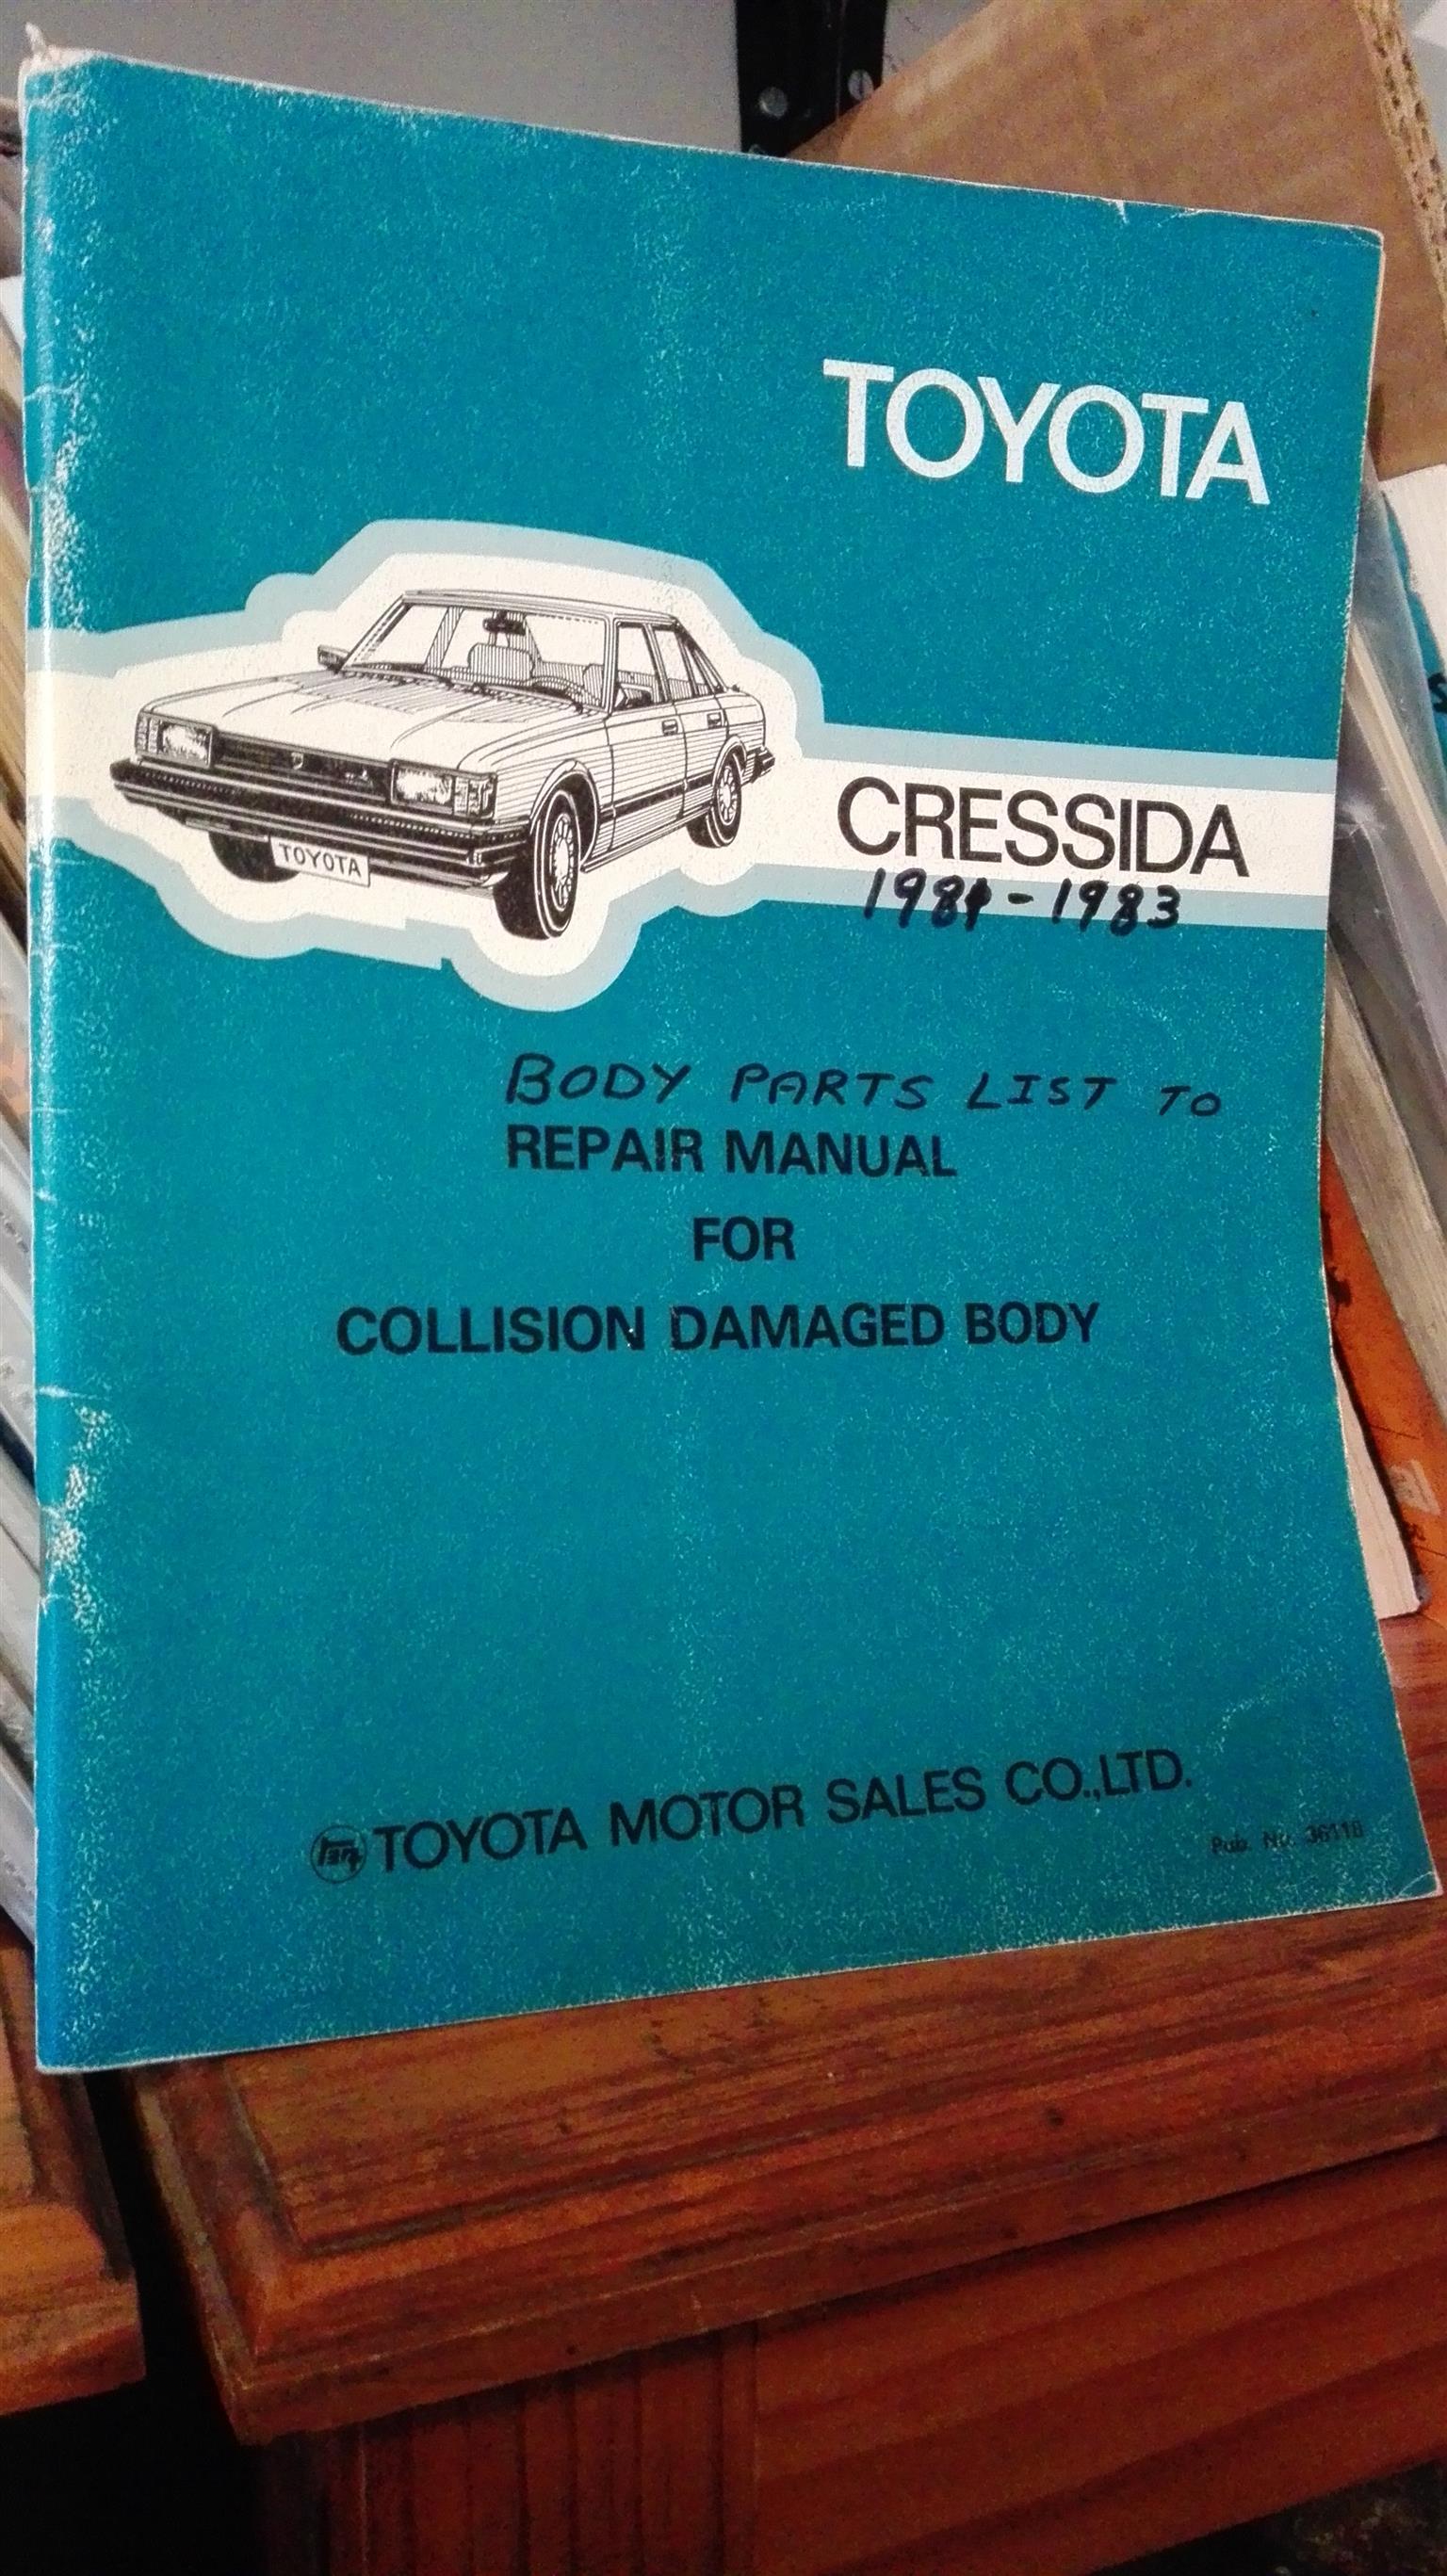 Cressida 1981 - 1983: body parts list